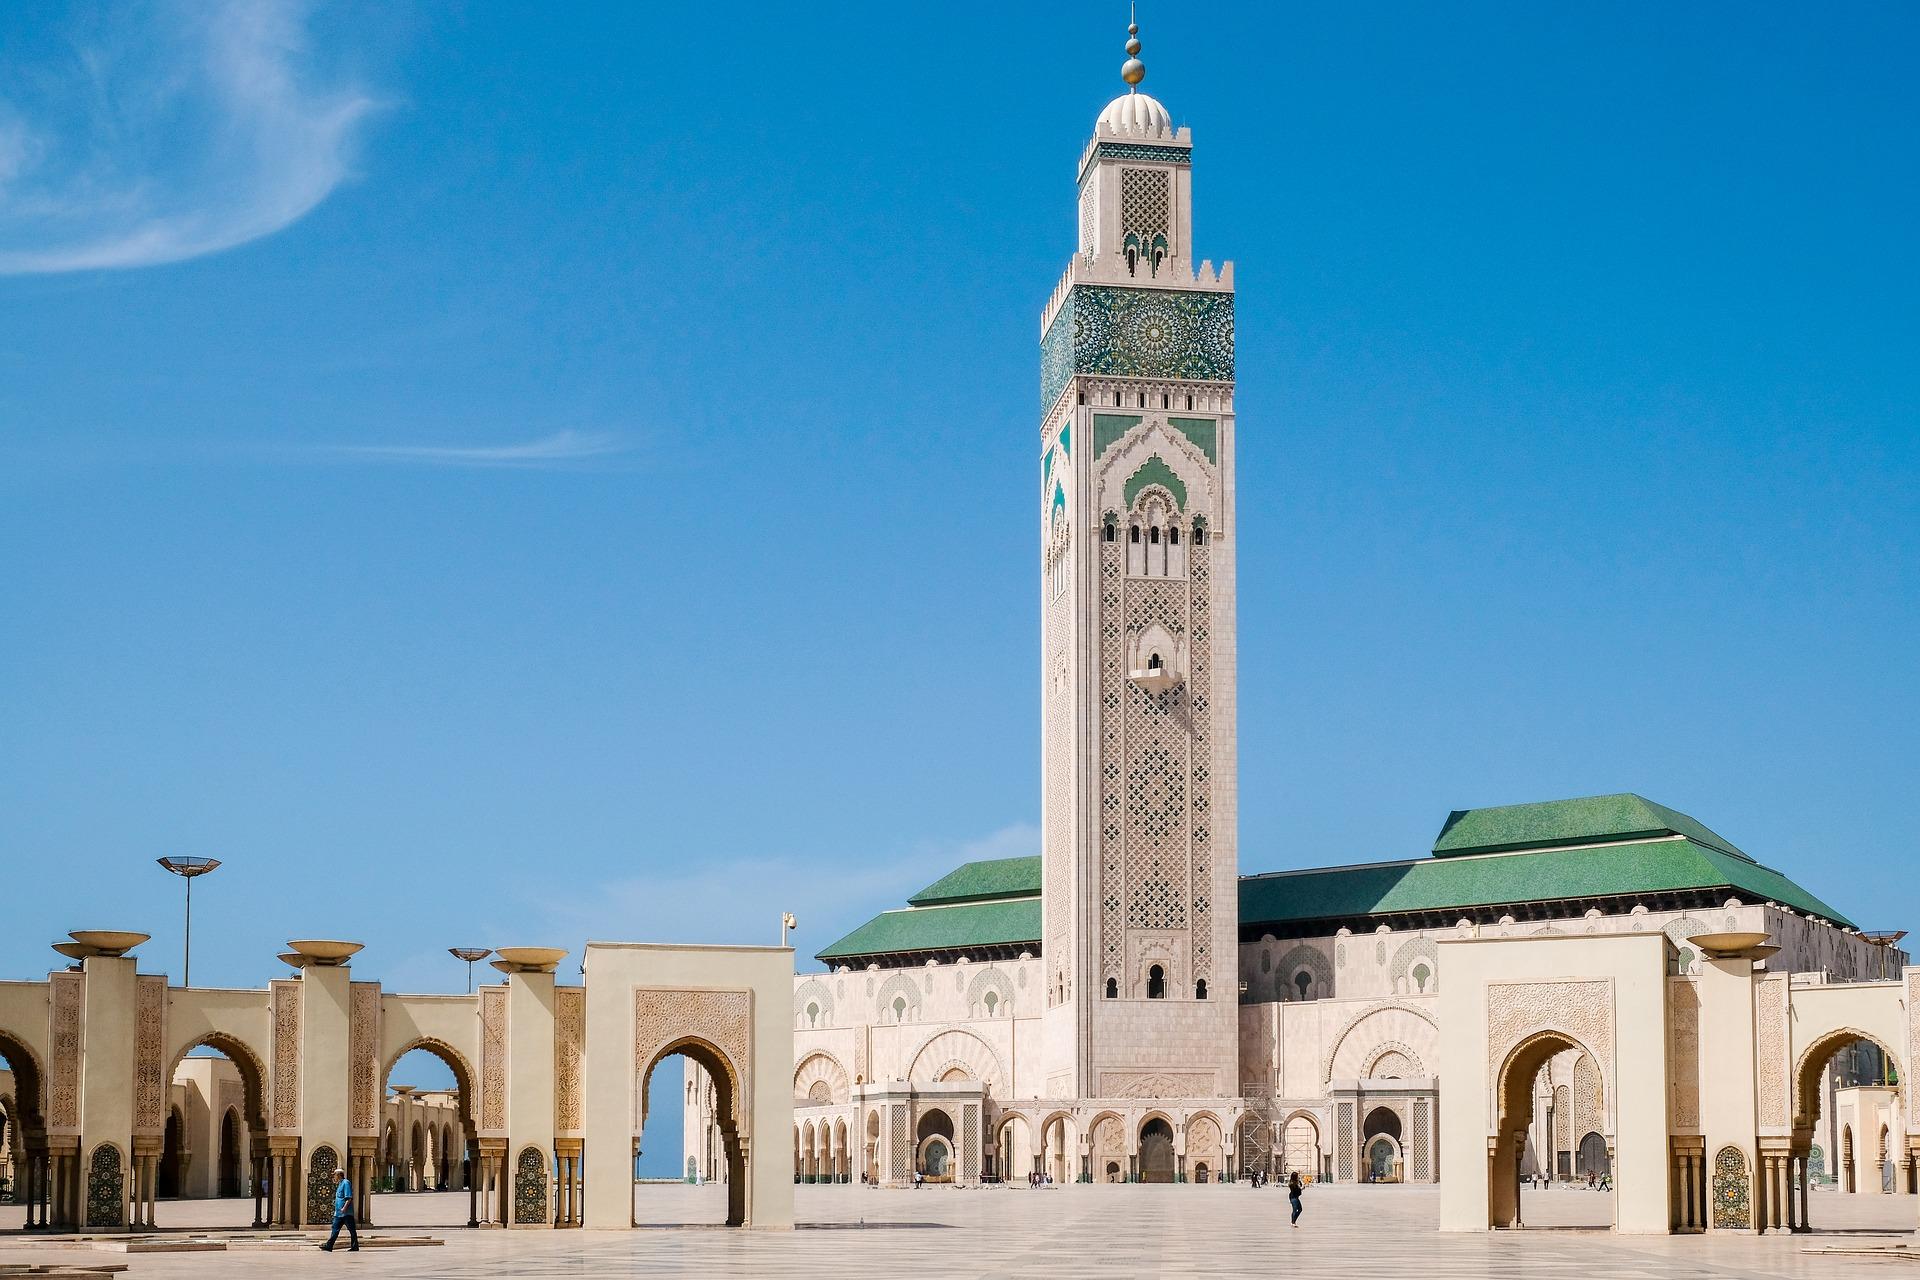 De Hassan II Moskee in Casablanca